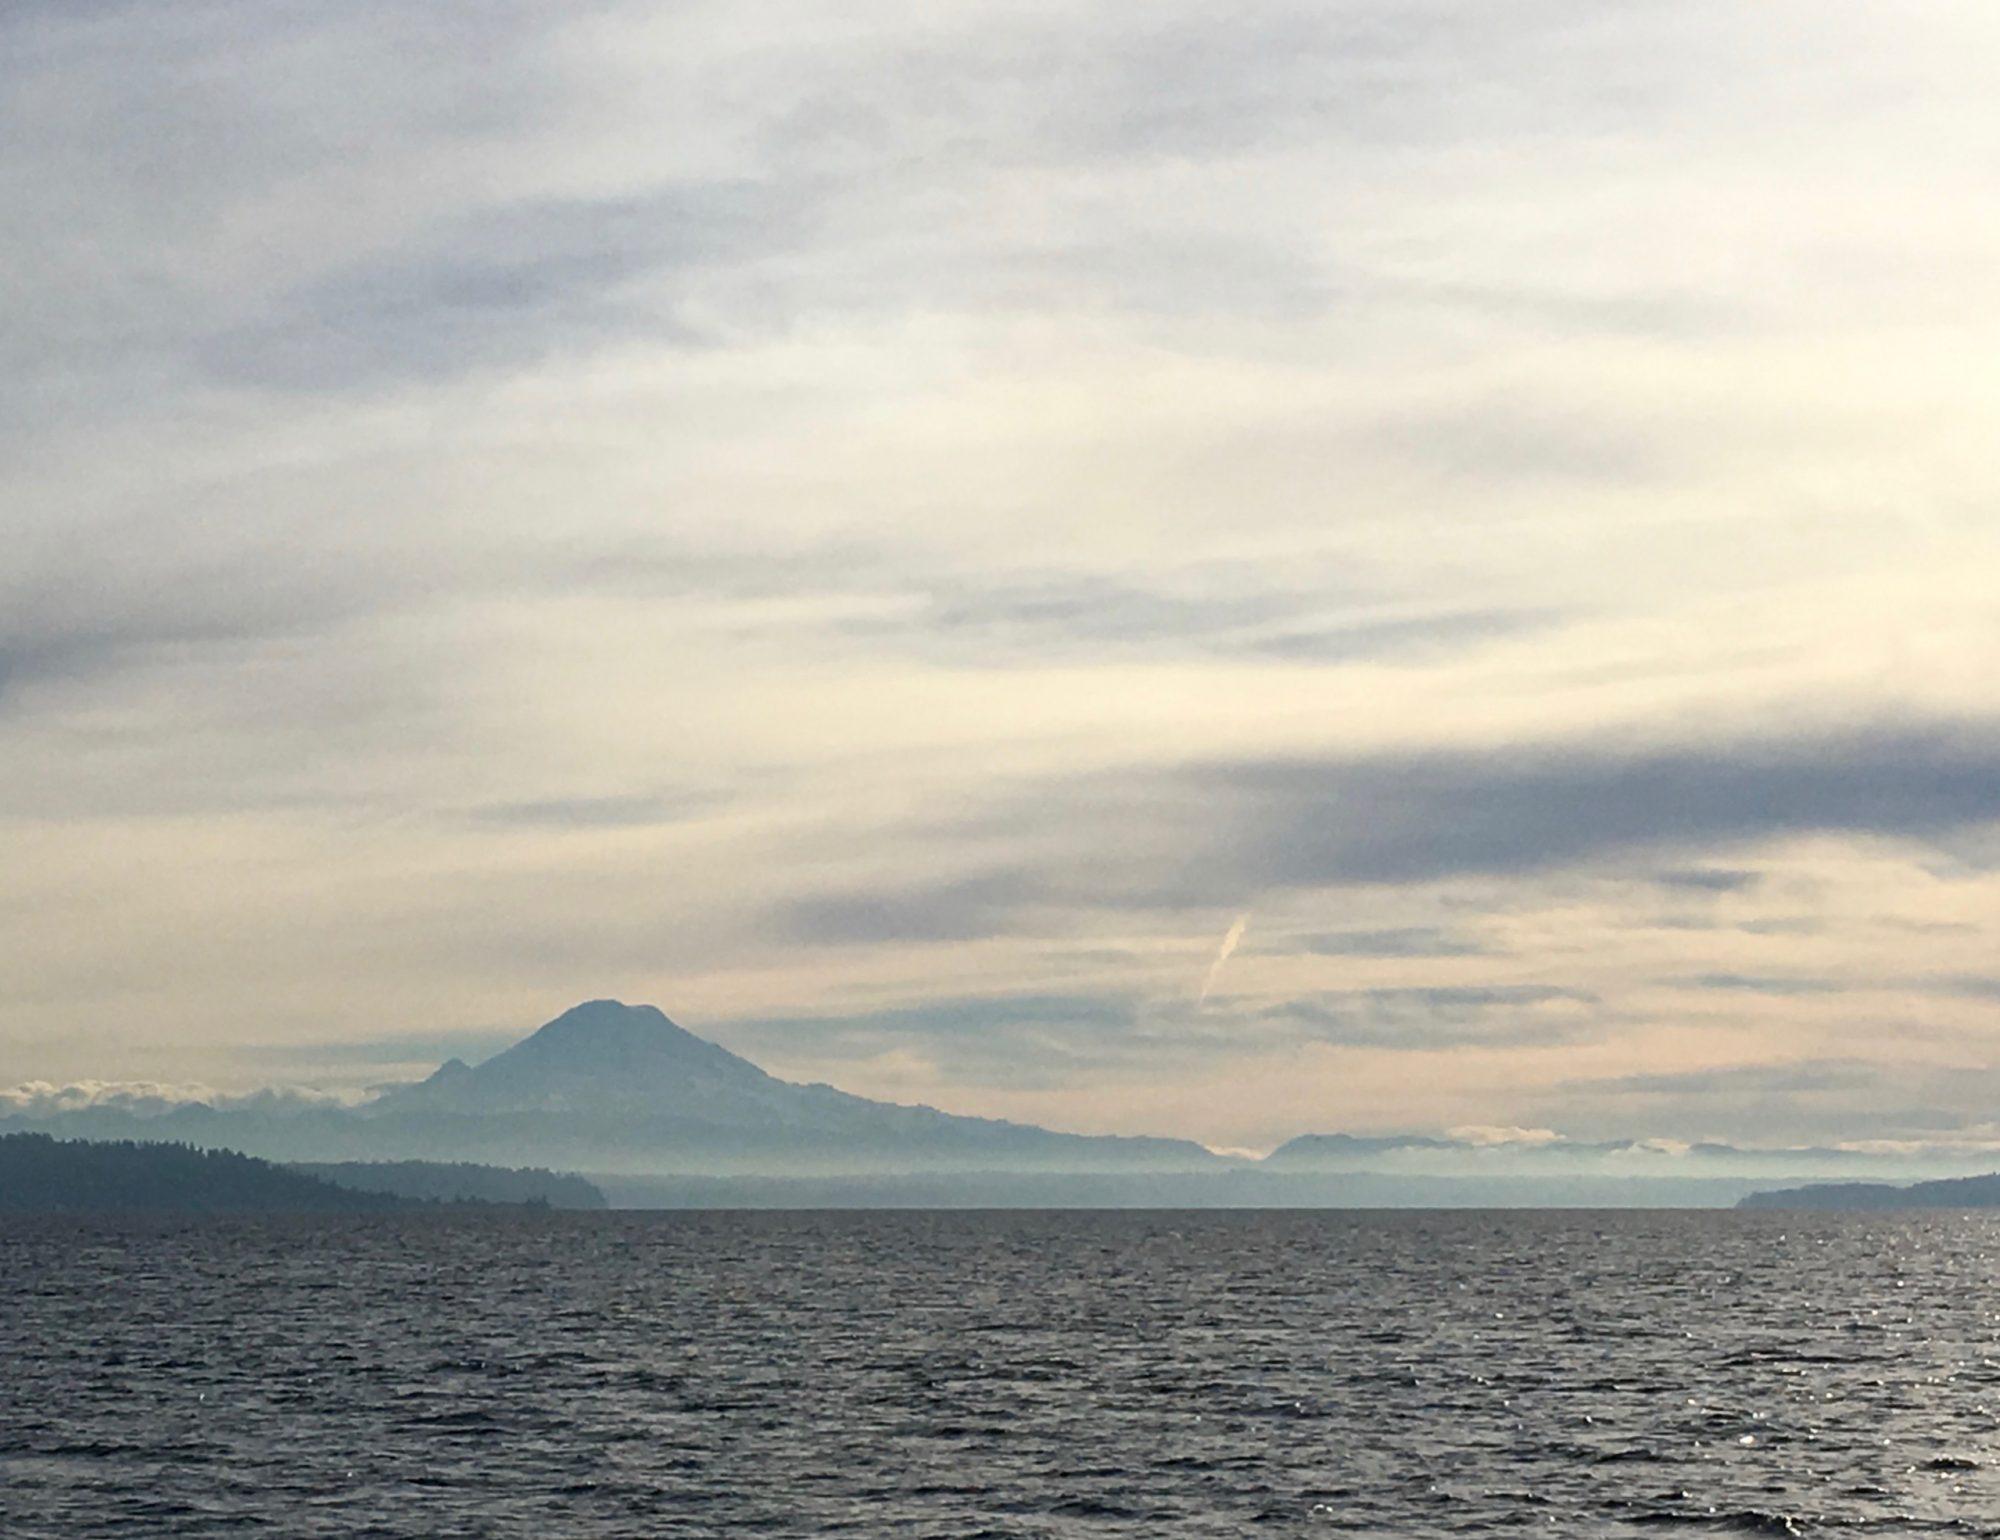 Mt. Rainier over the Puget Sound